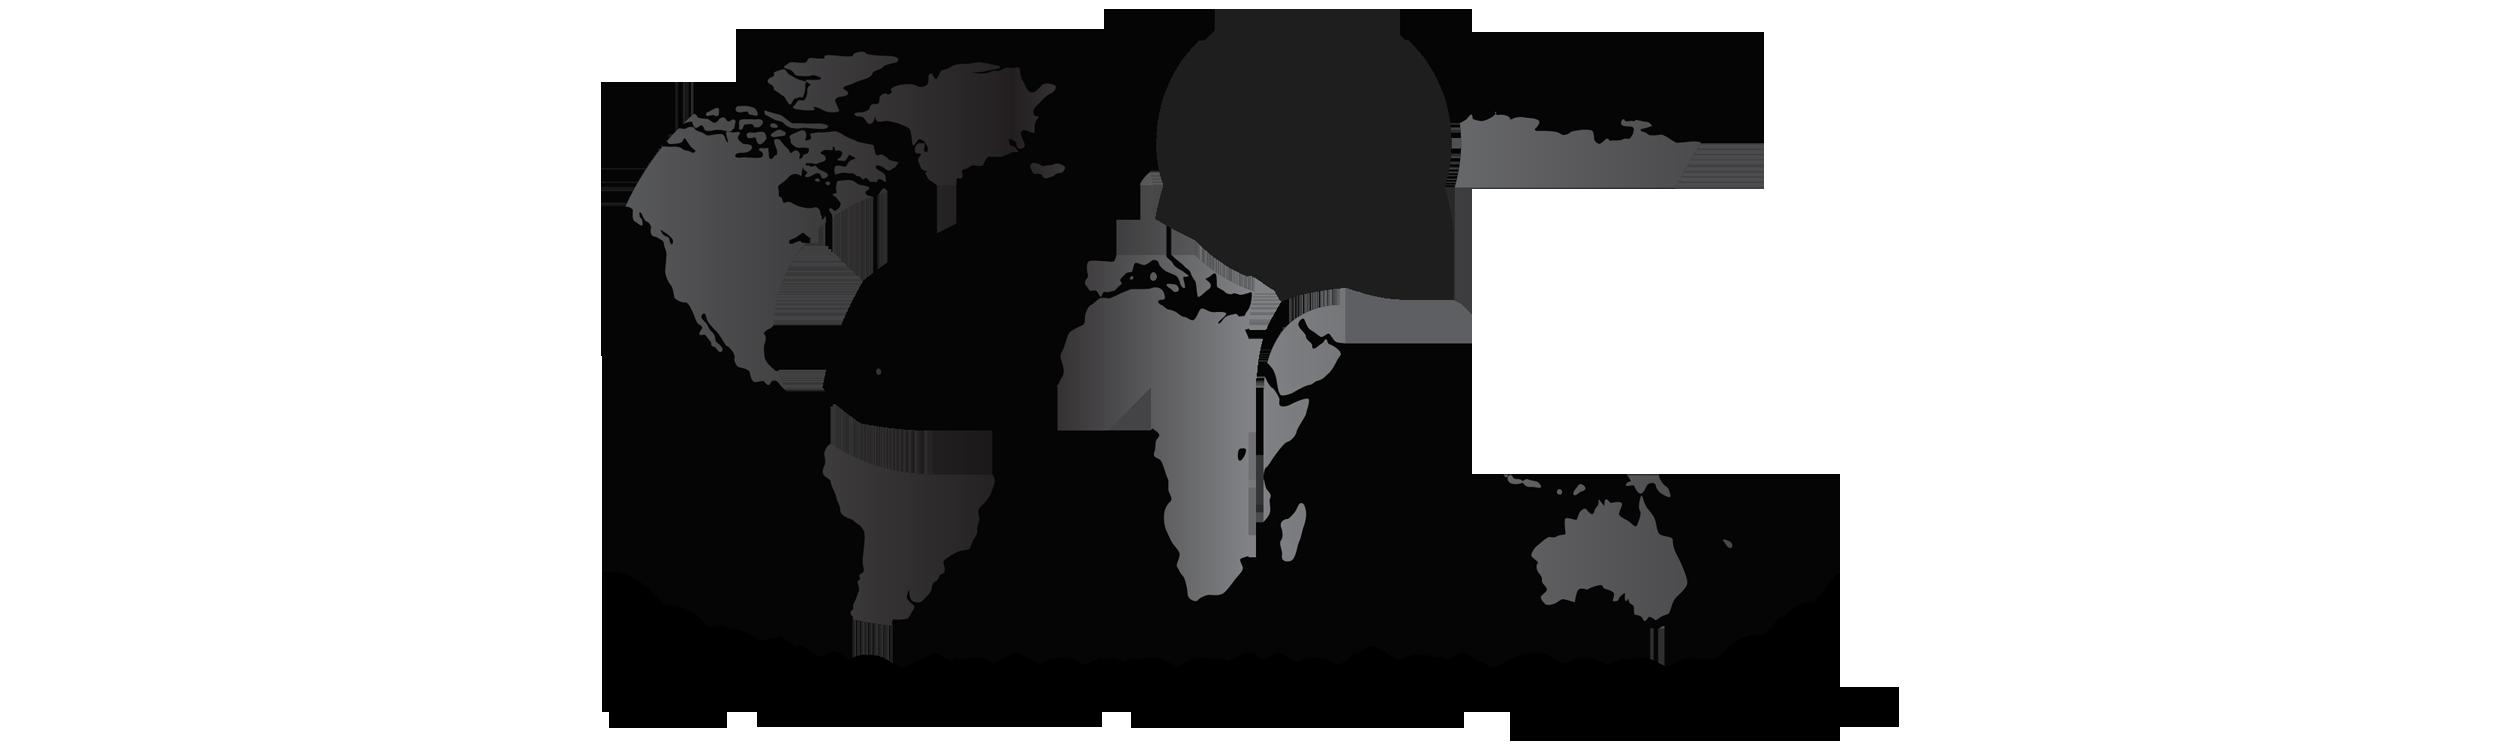 Genius International Concepts